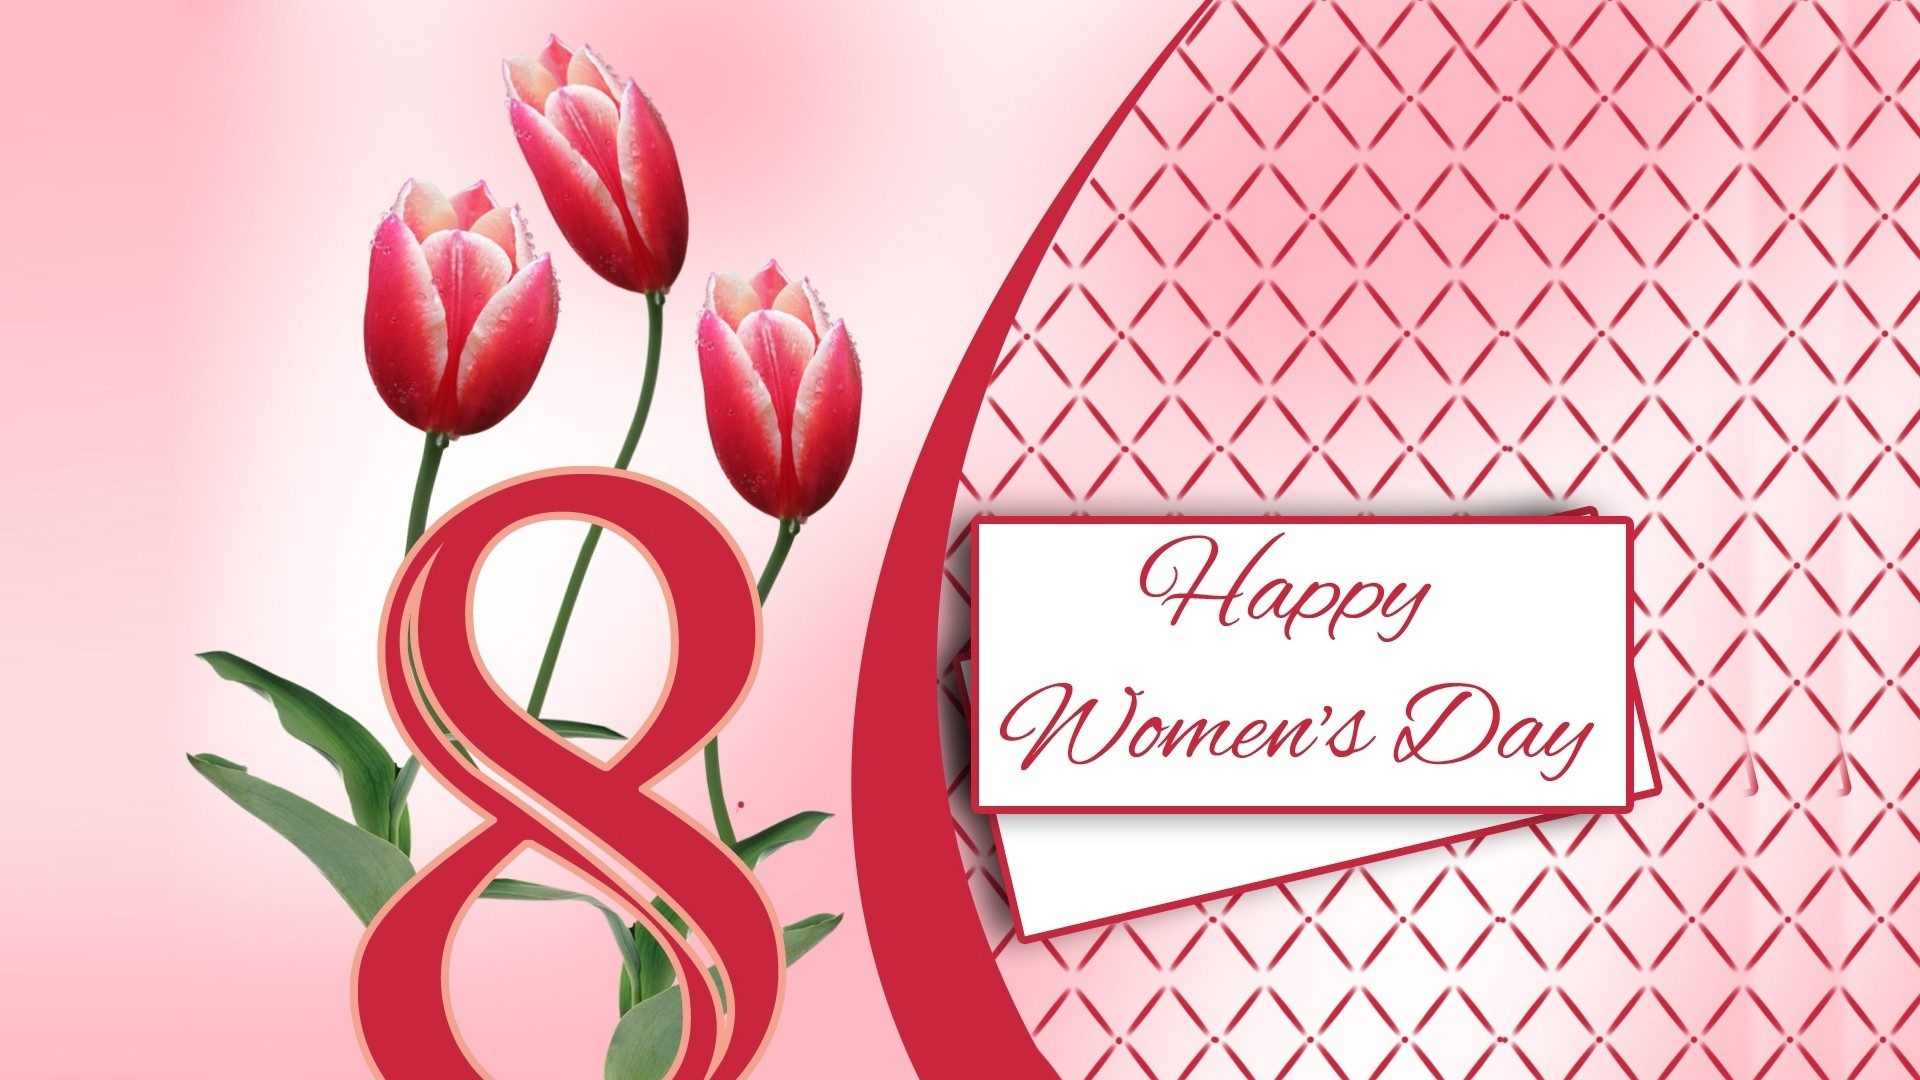 Happy Women's Day background image